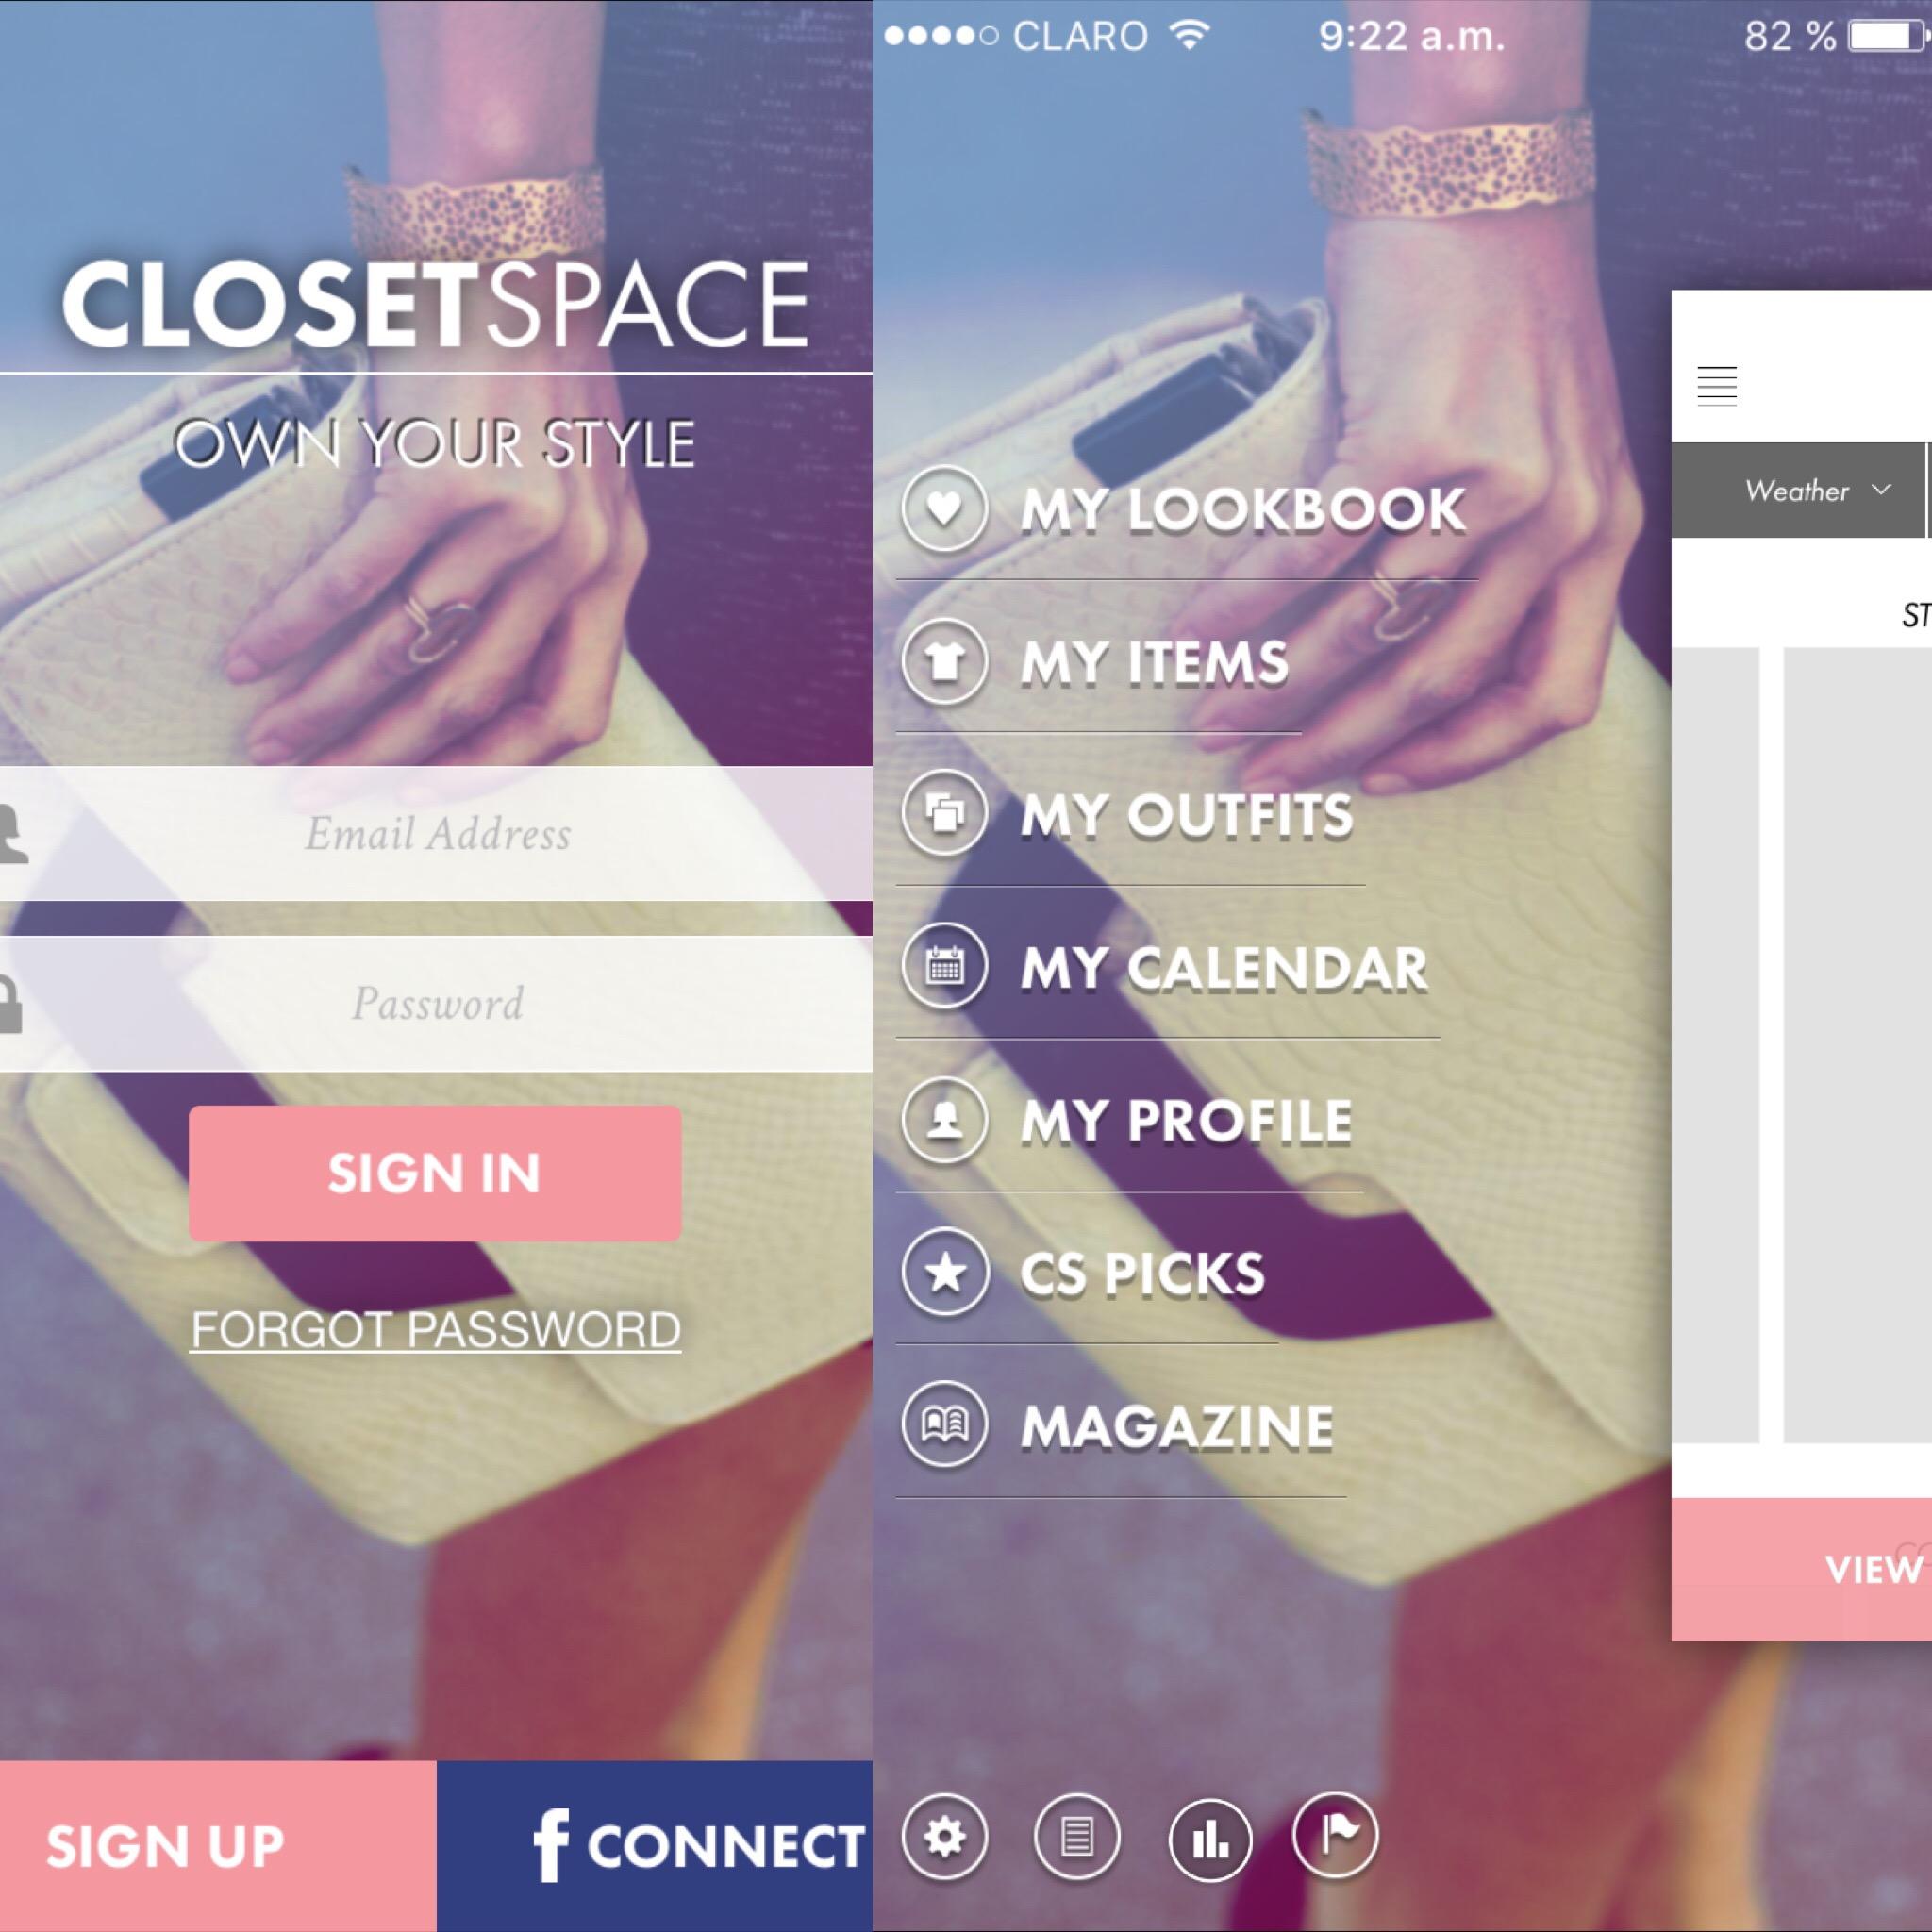 ClosetSpace